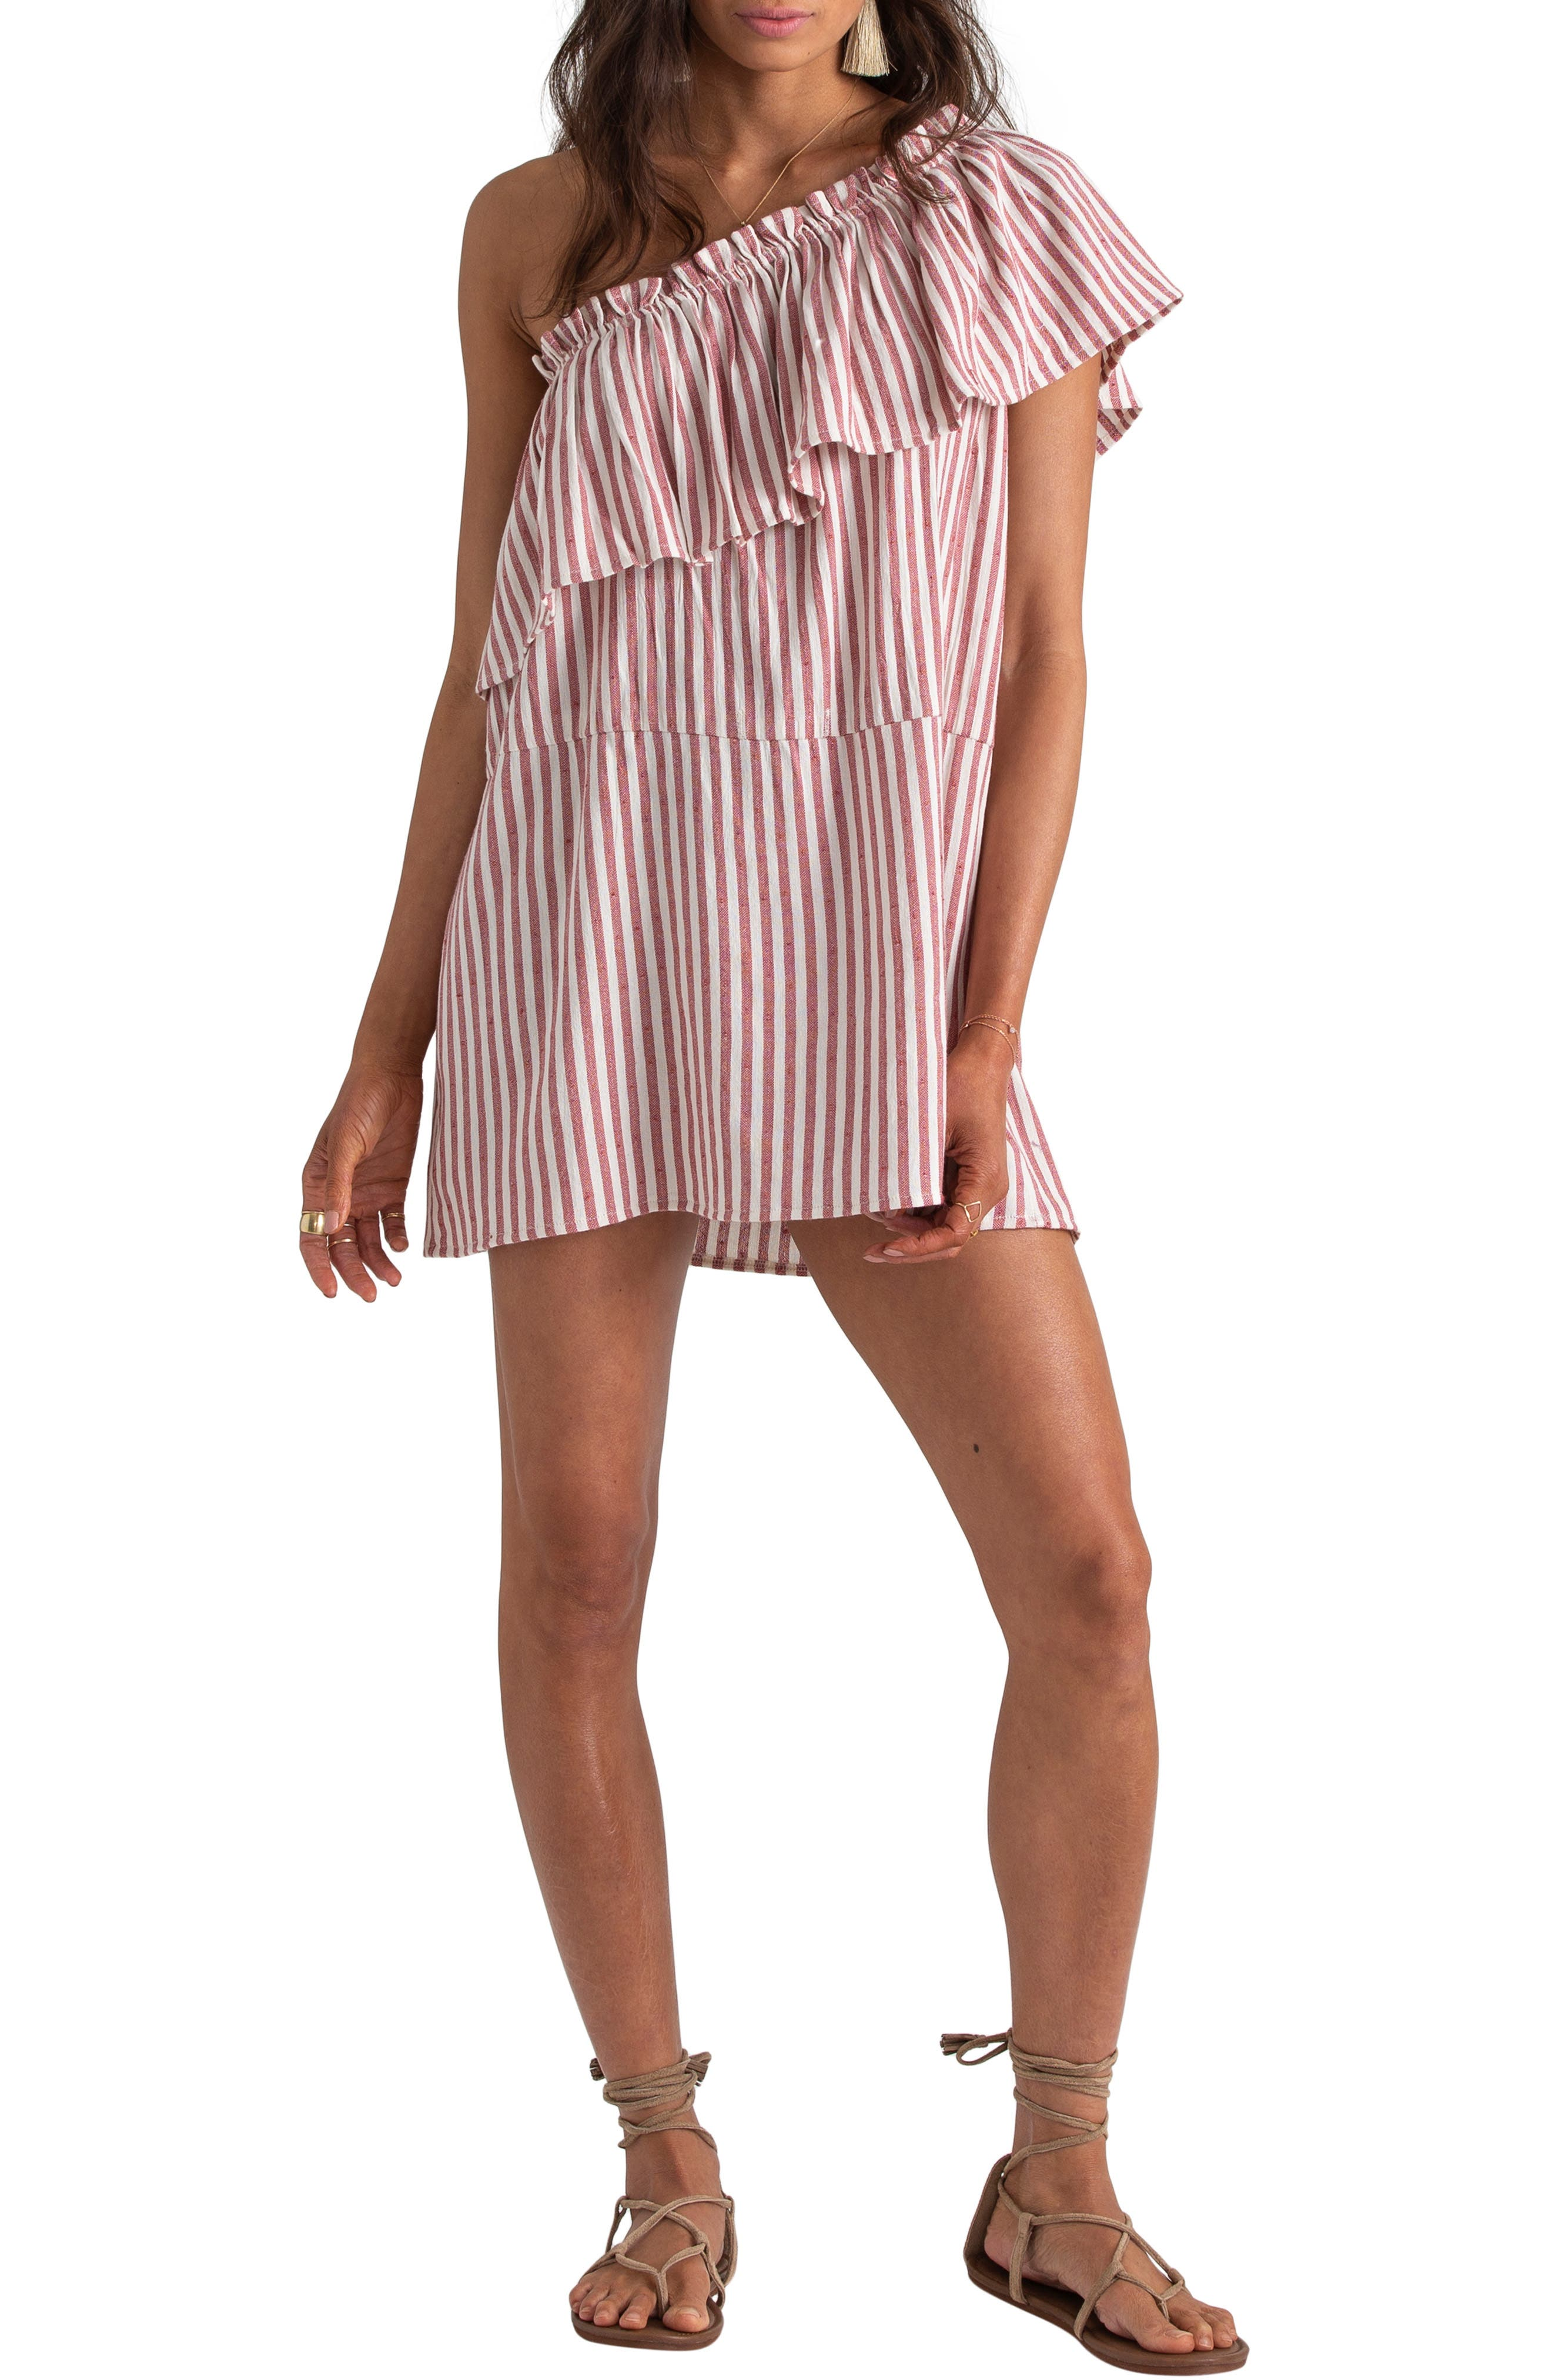 Billabong X Sincerely Jules Right Minded One-Shoulder Dress, Coral